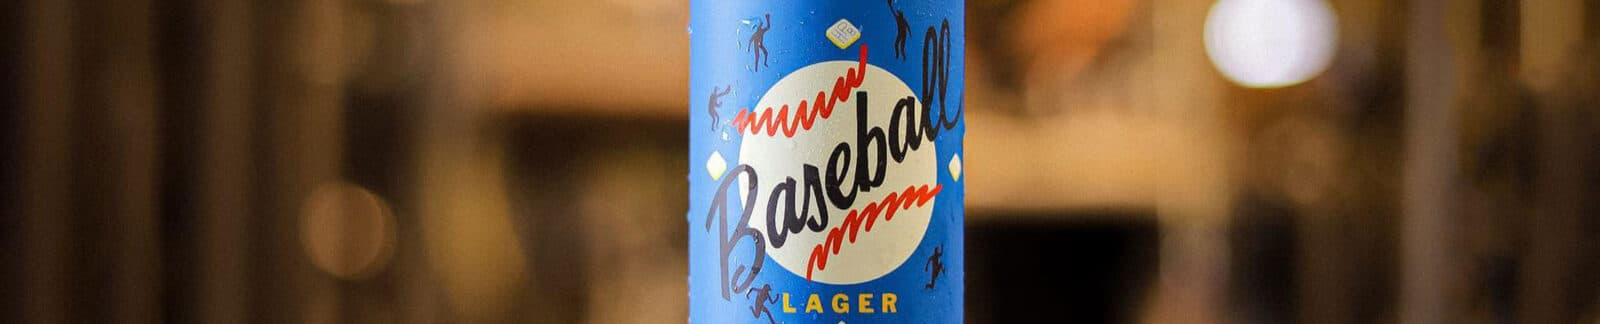 Baseball Lager Beer by Highland Park Brewery header